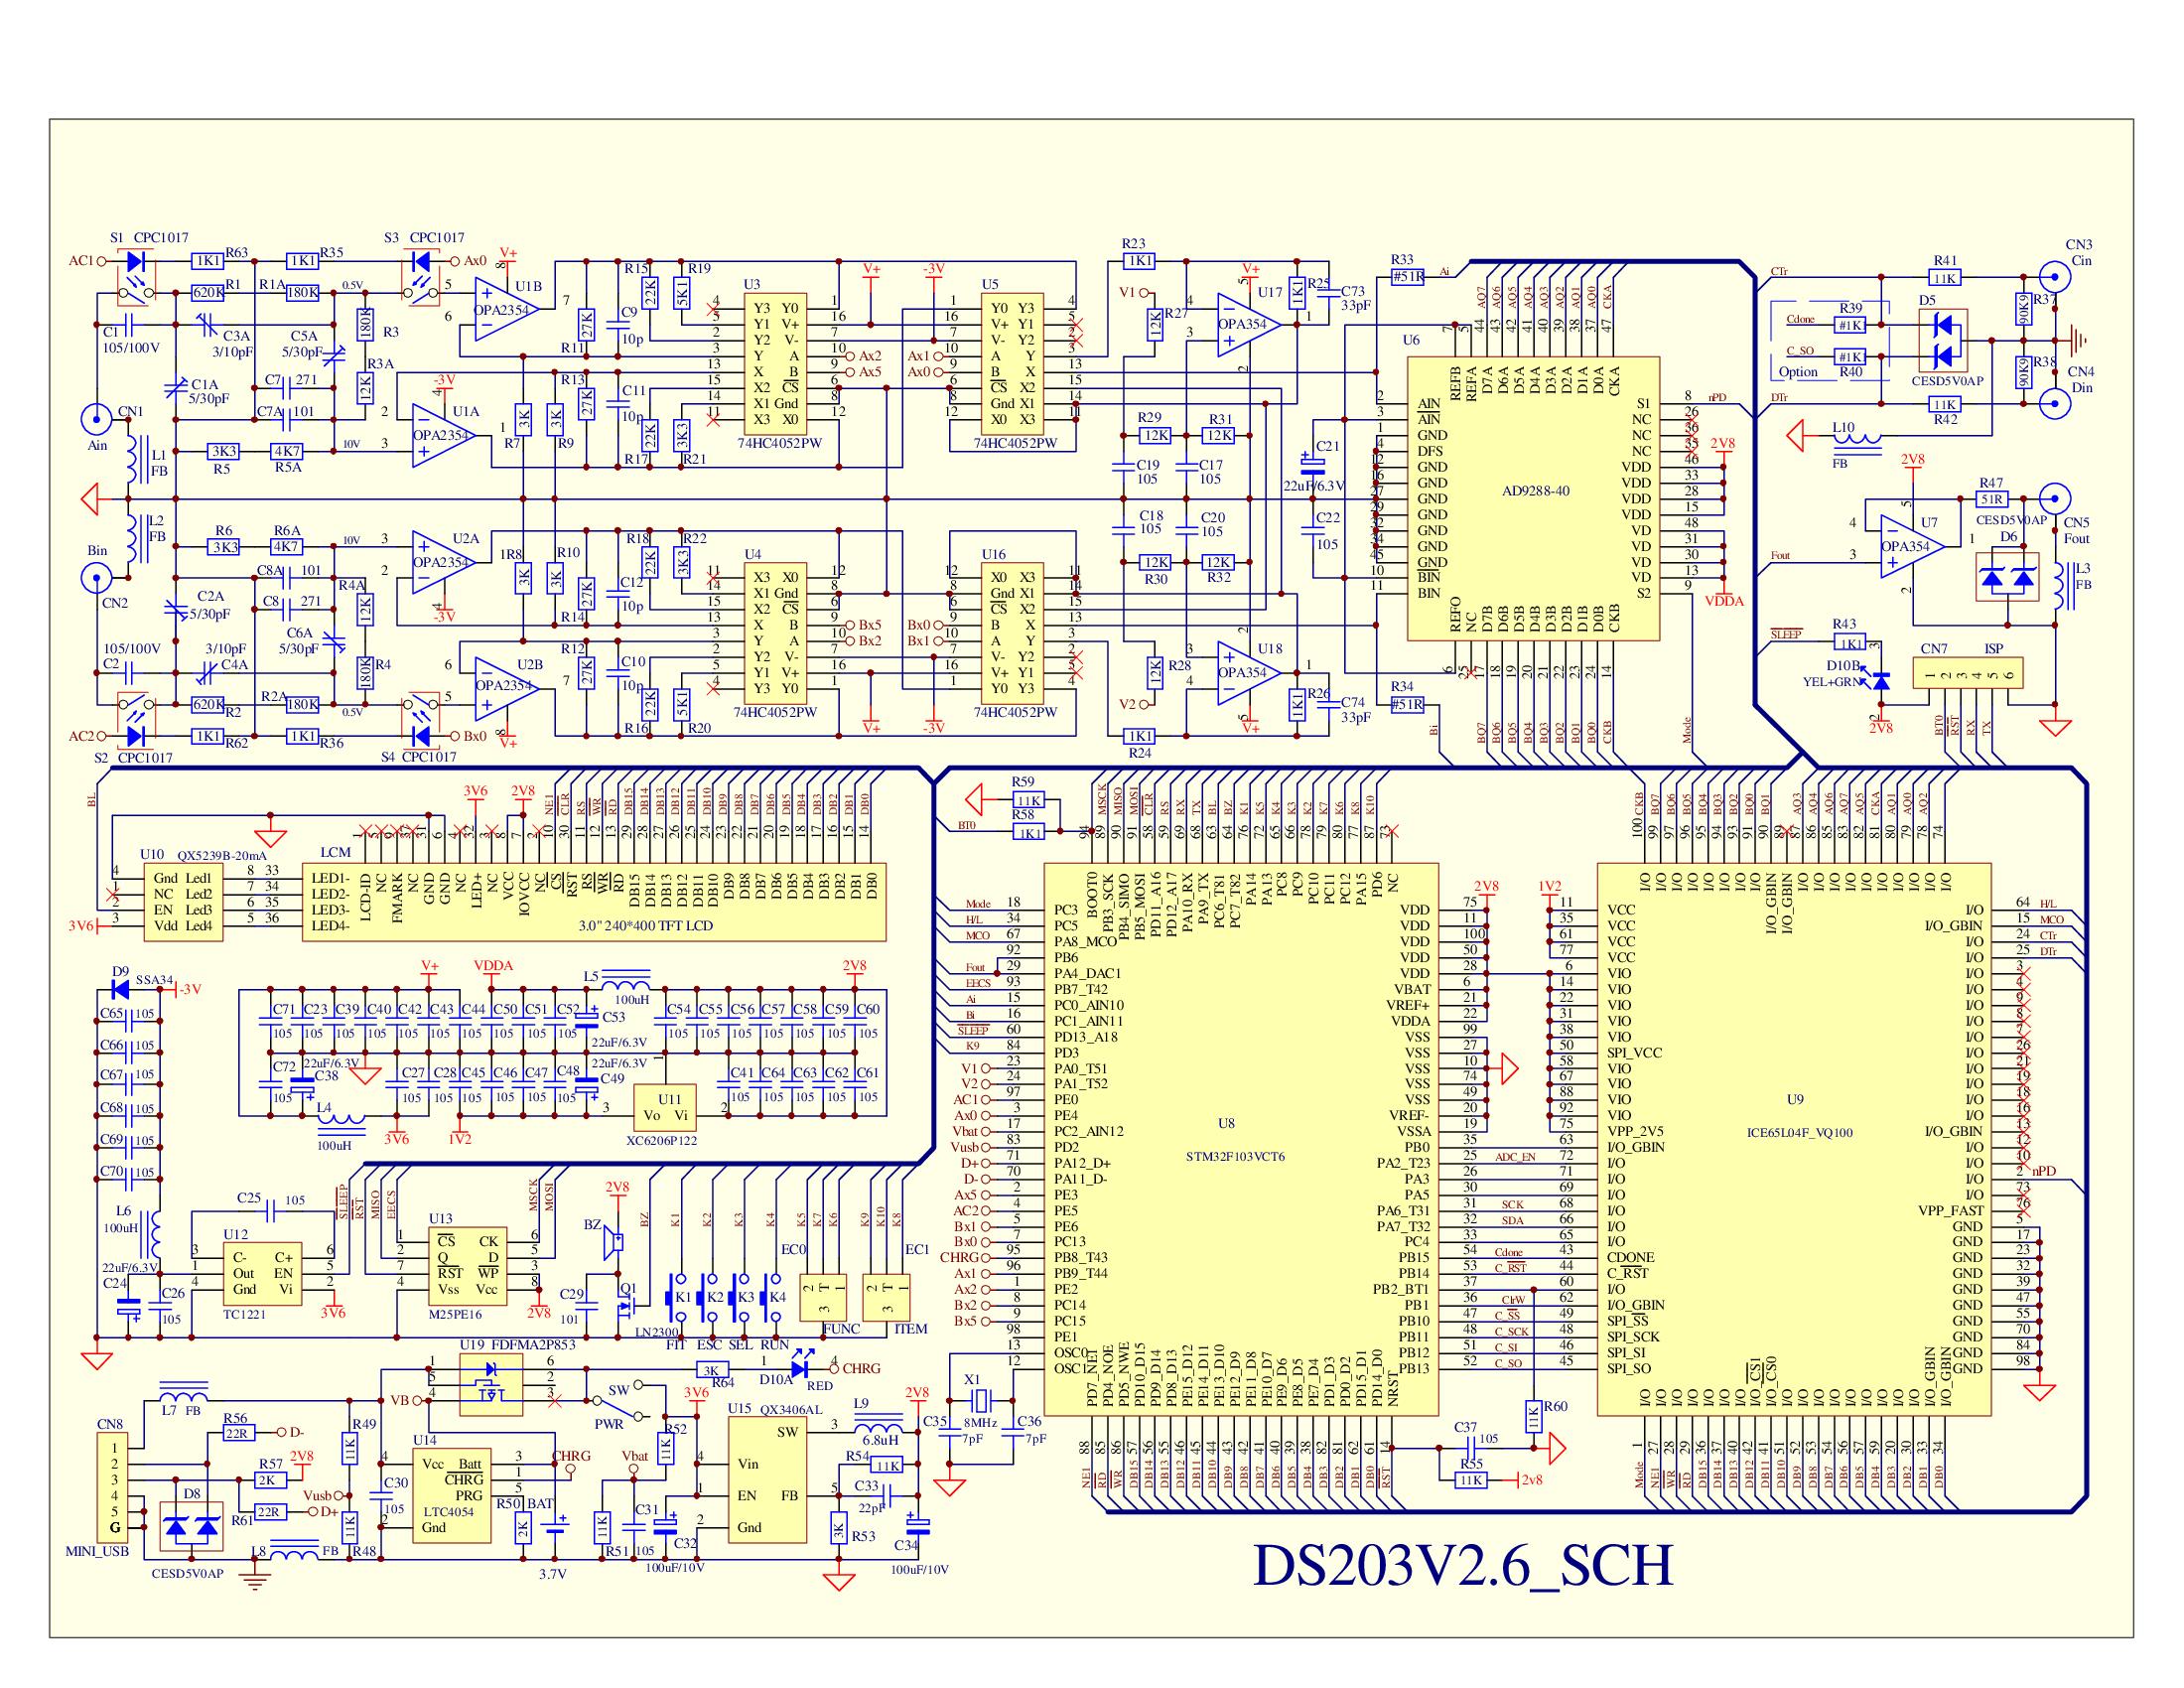 comments for usb protocol analyzer essential scrap rh essentialscrap com  usb pc oscilloscope schematic